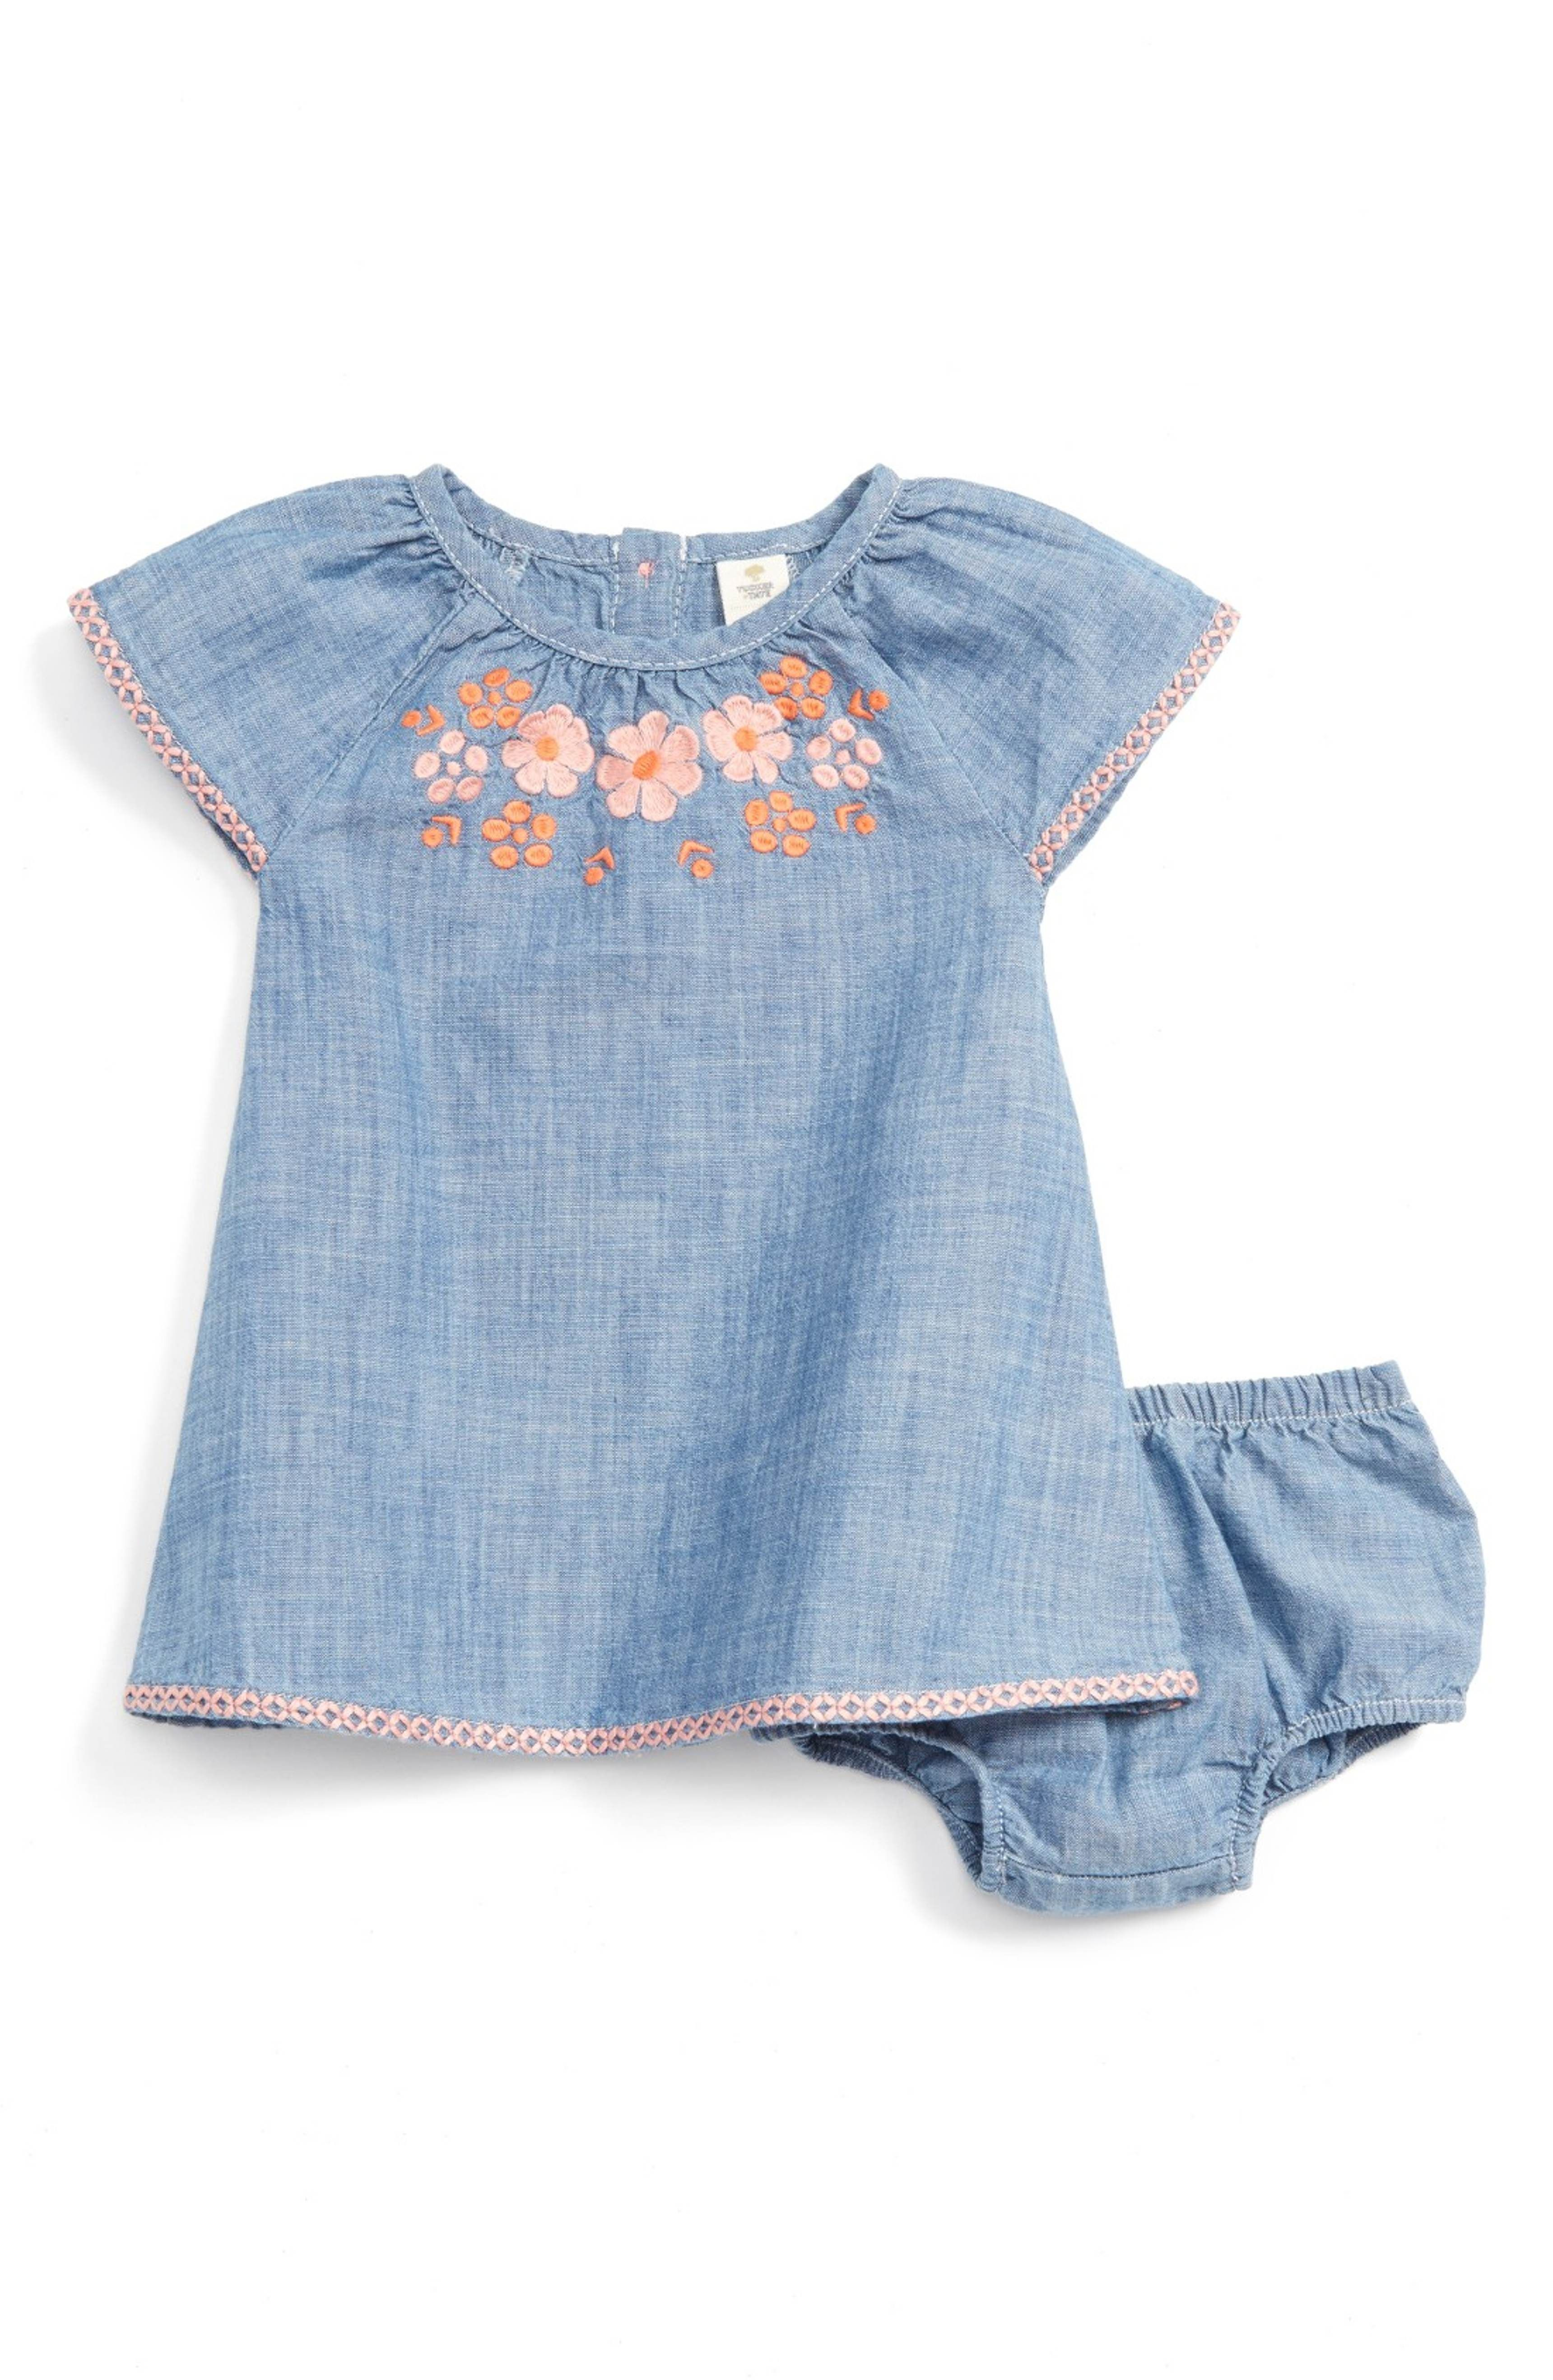 Main Image Tucker Tate Embroidered Chambray Dress Baby Girls